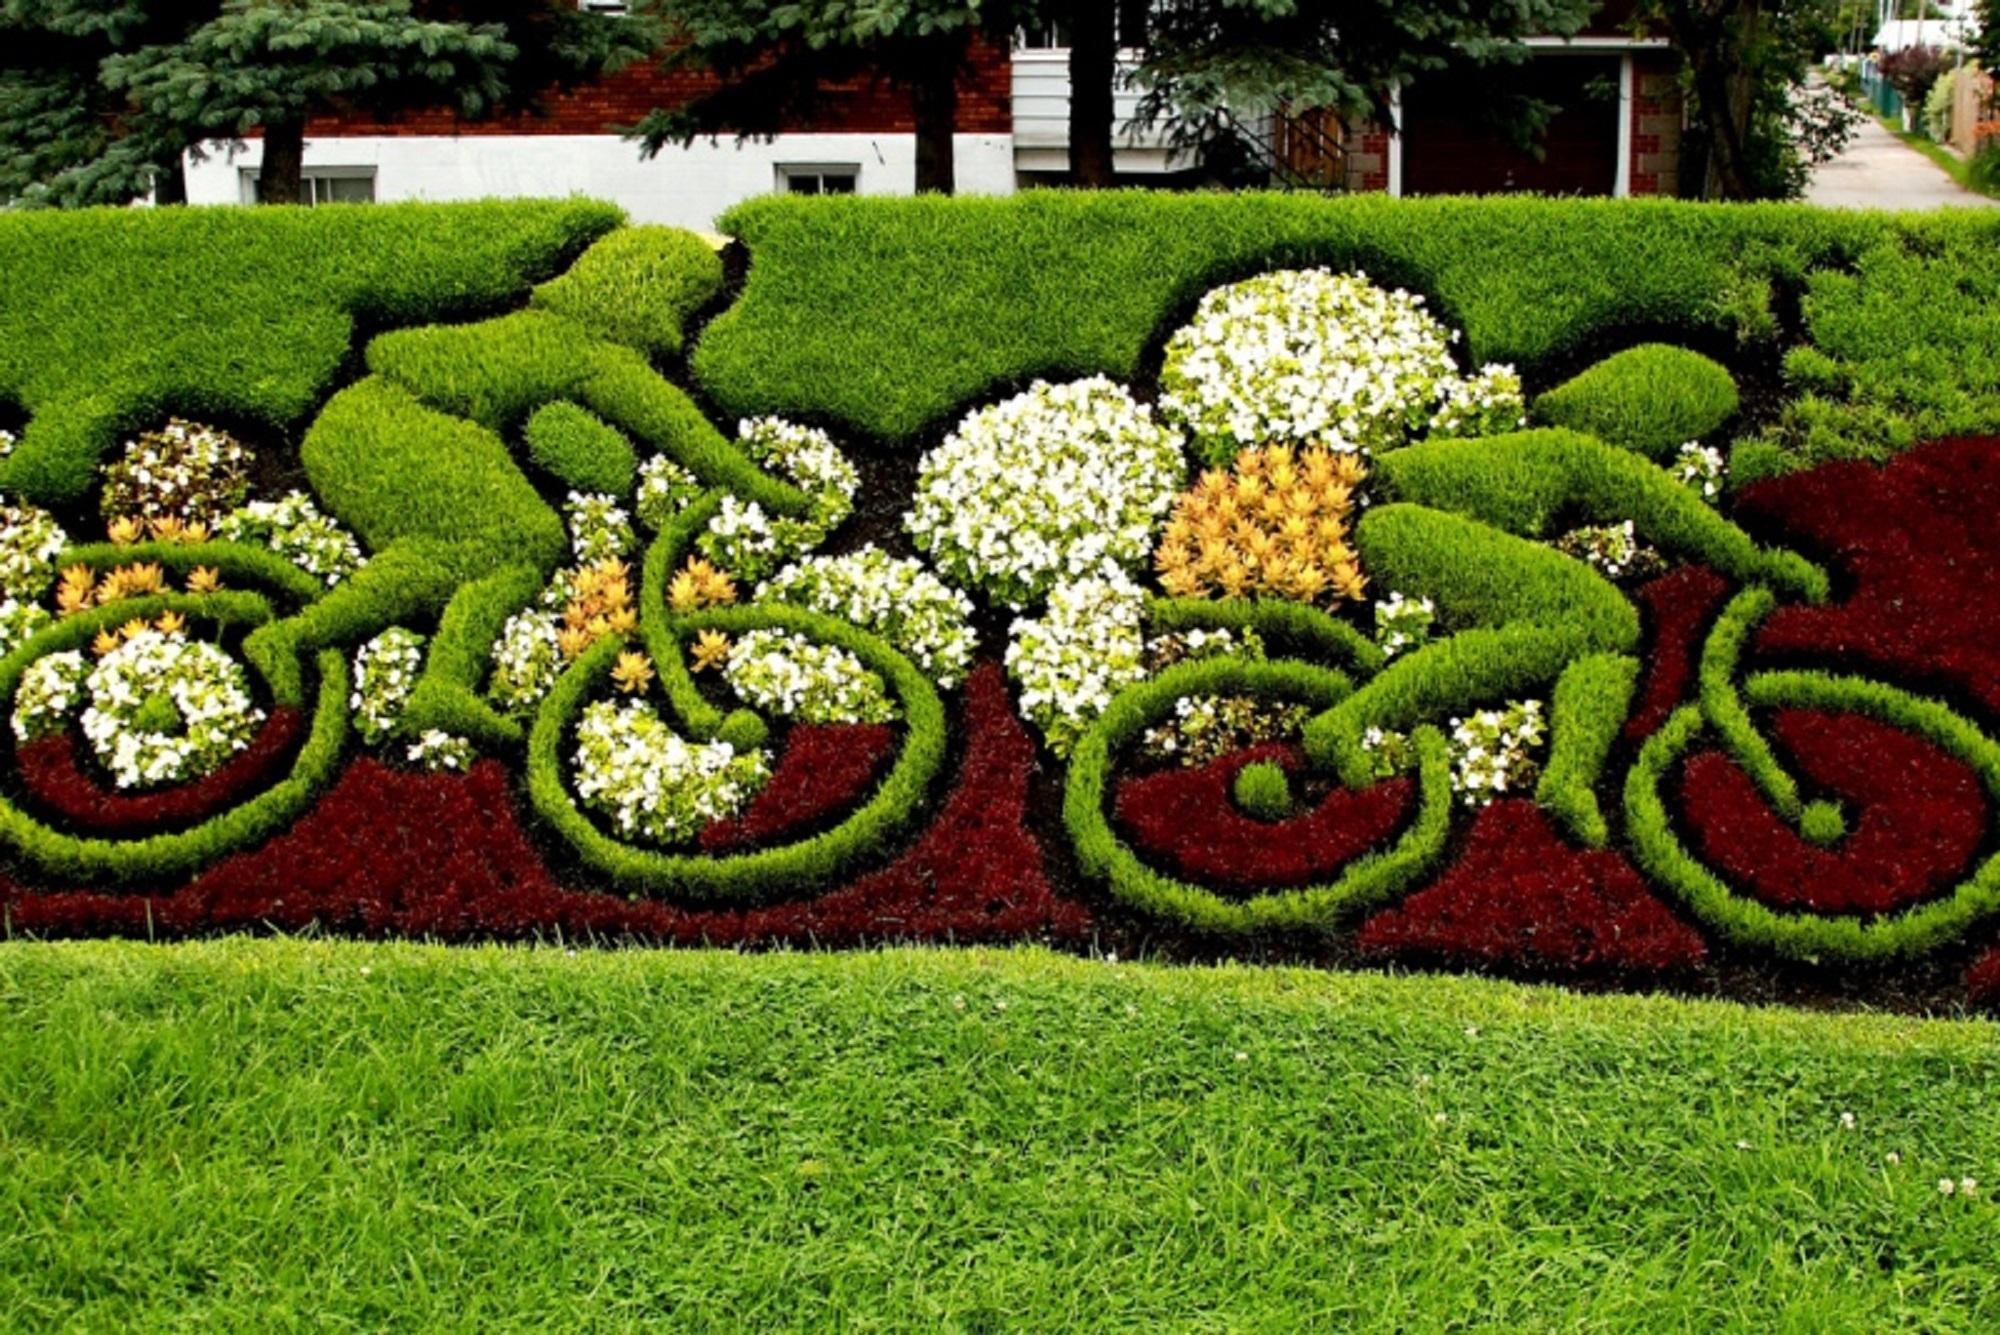 ethiopia u0027s first botanic garden aims to preserve country u0027s flora